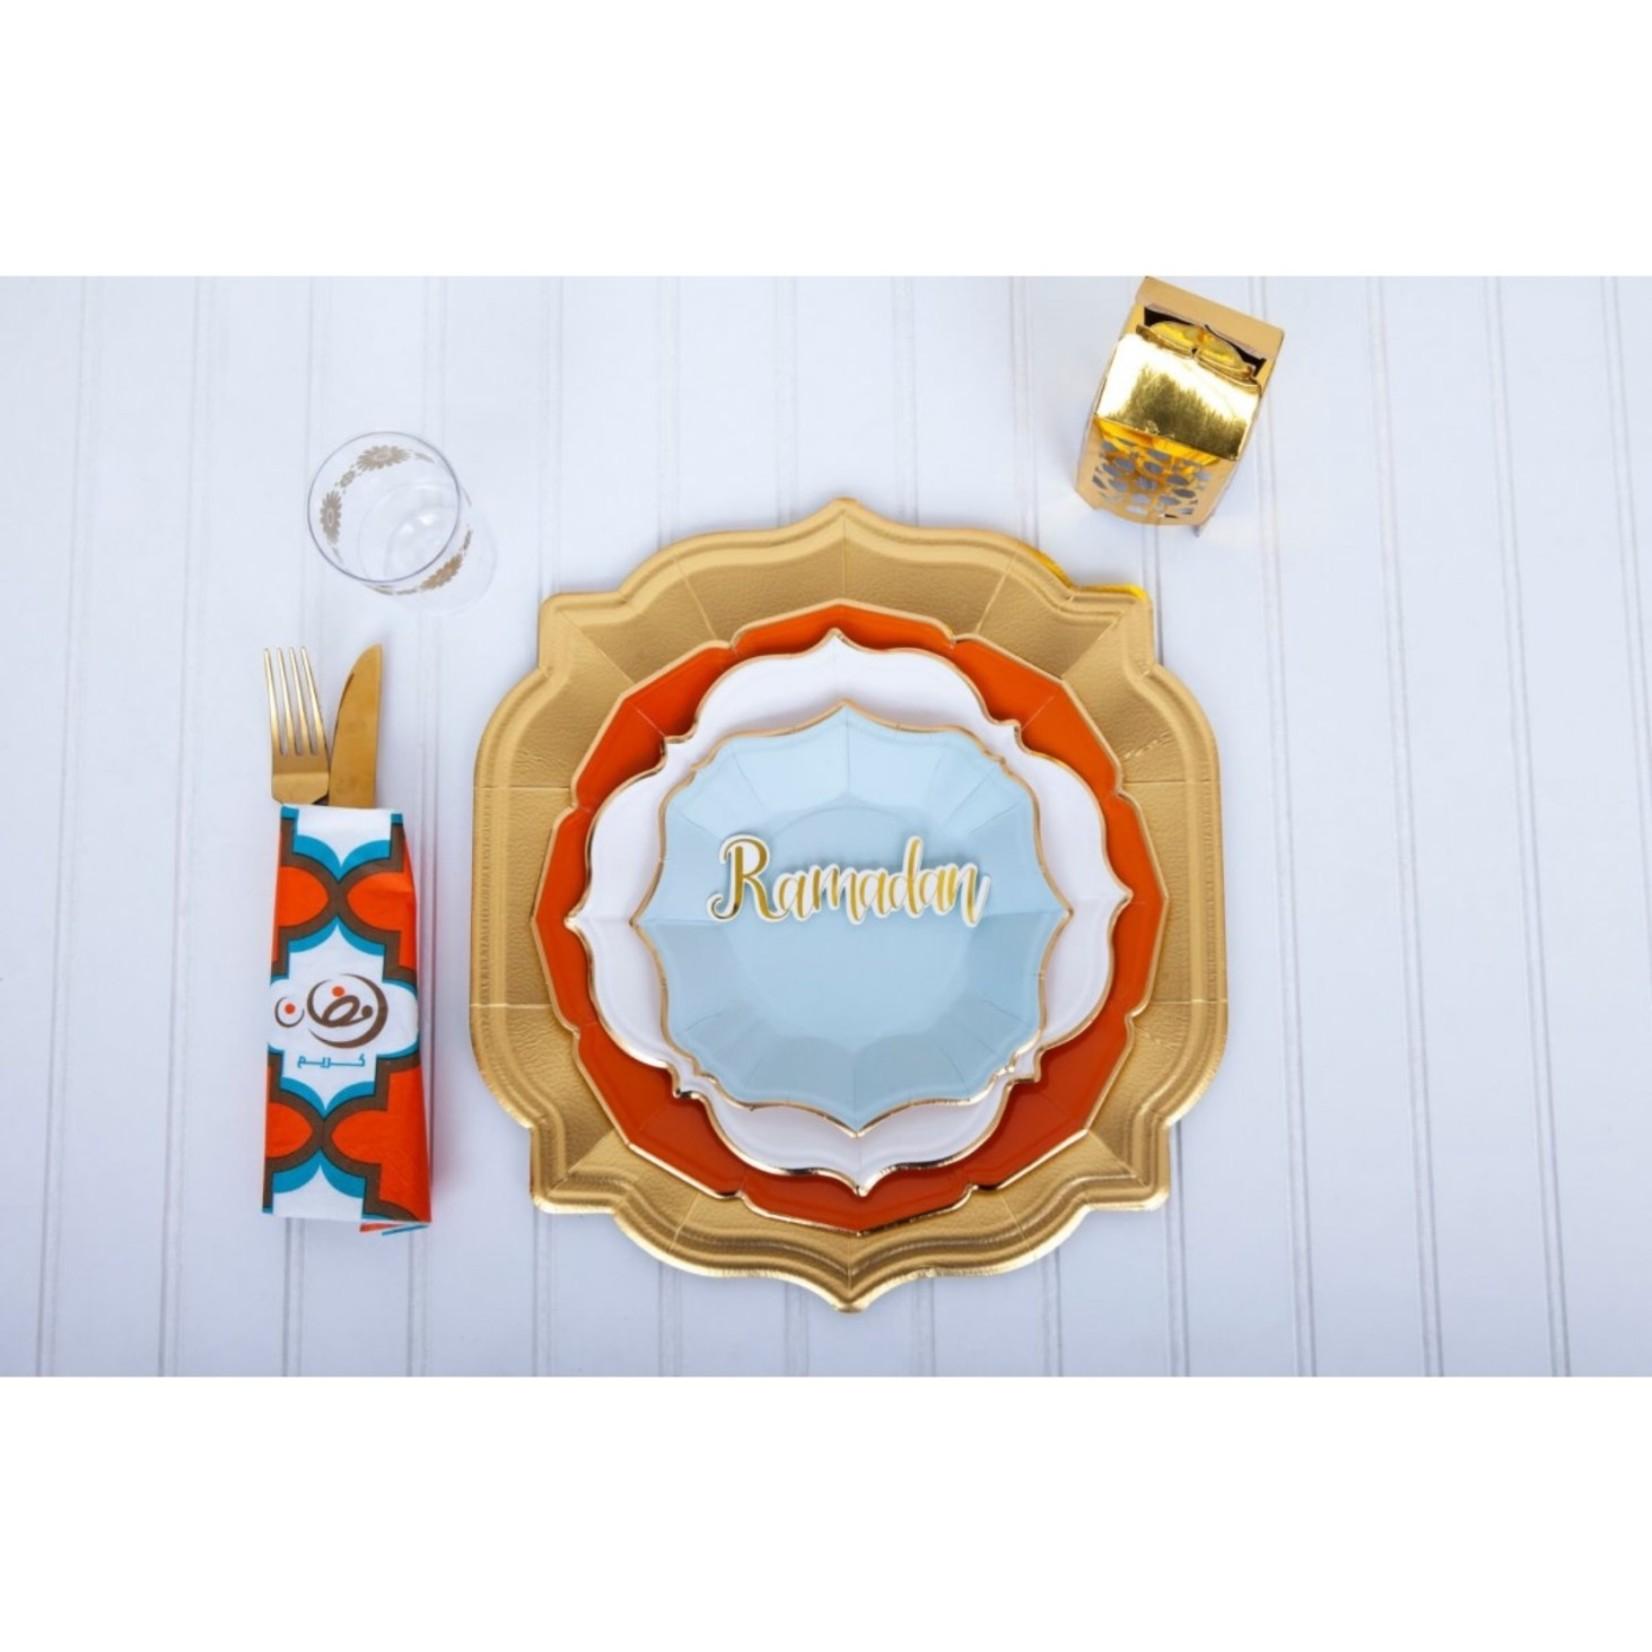 Eid Creations Arabesque Ramadan Dinner Napkins